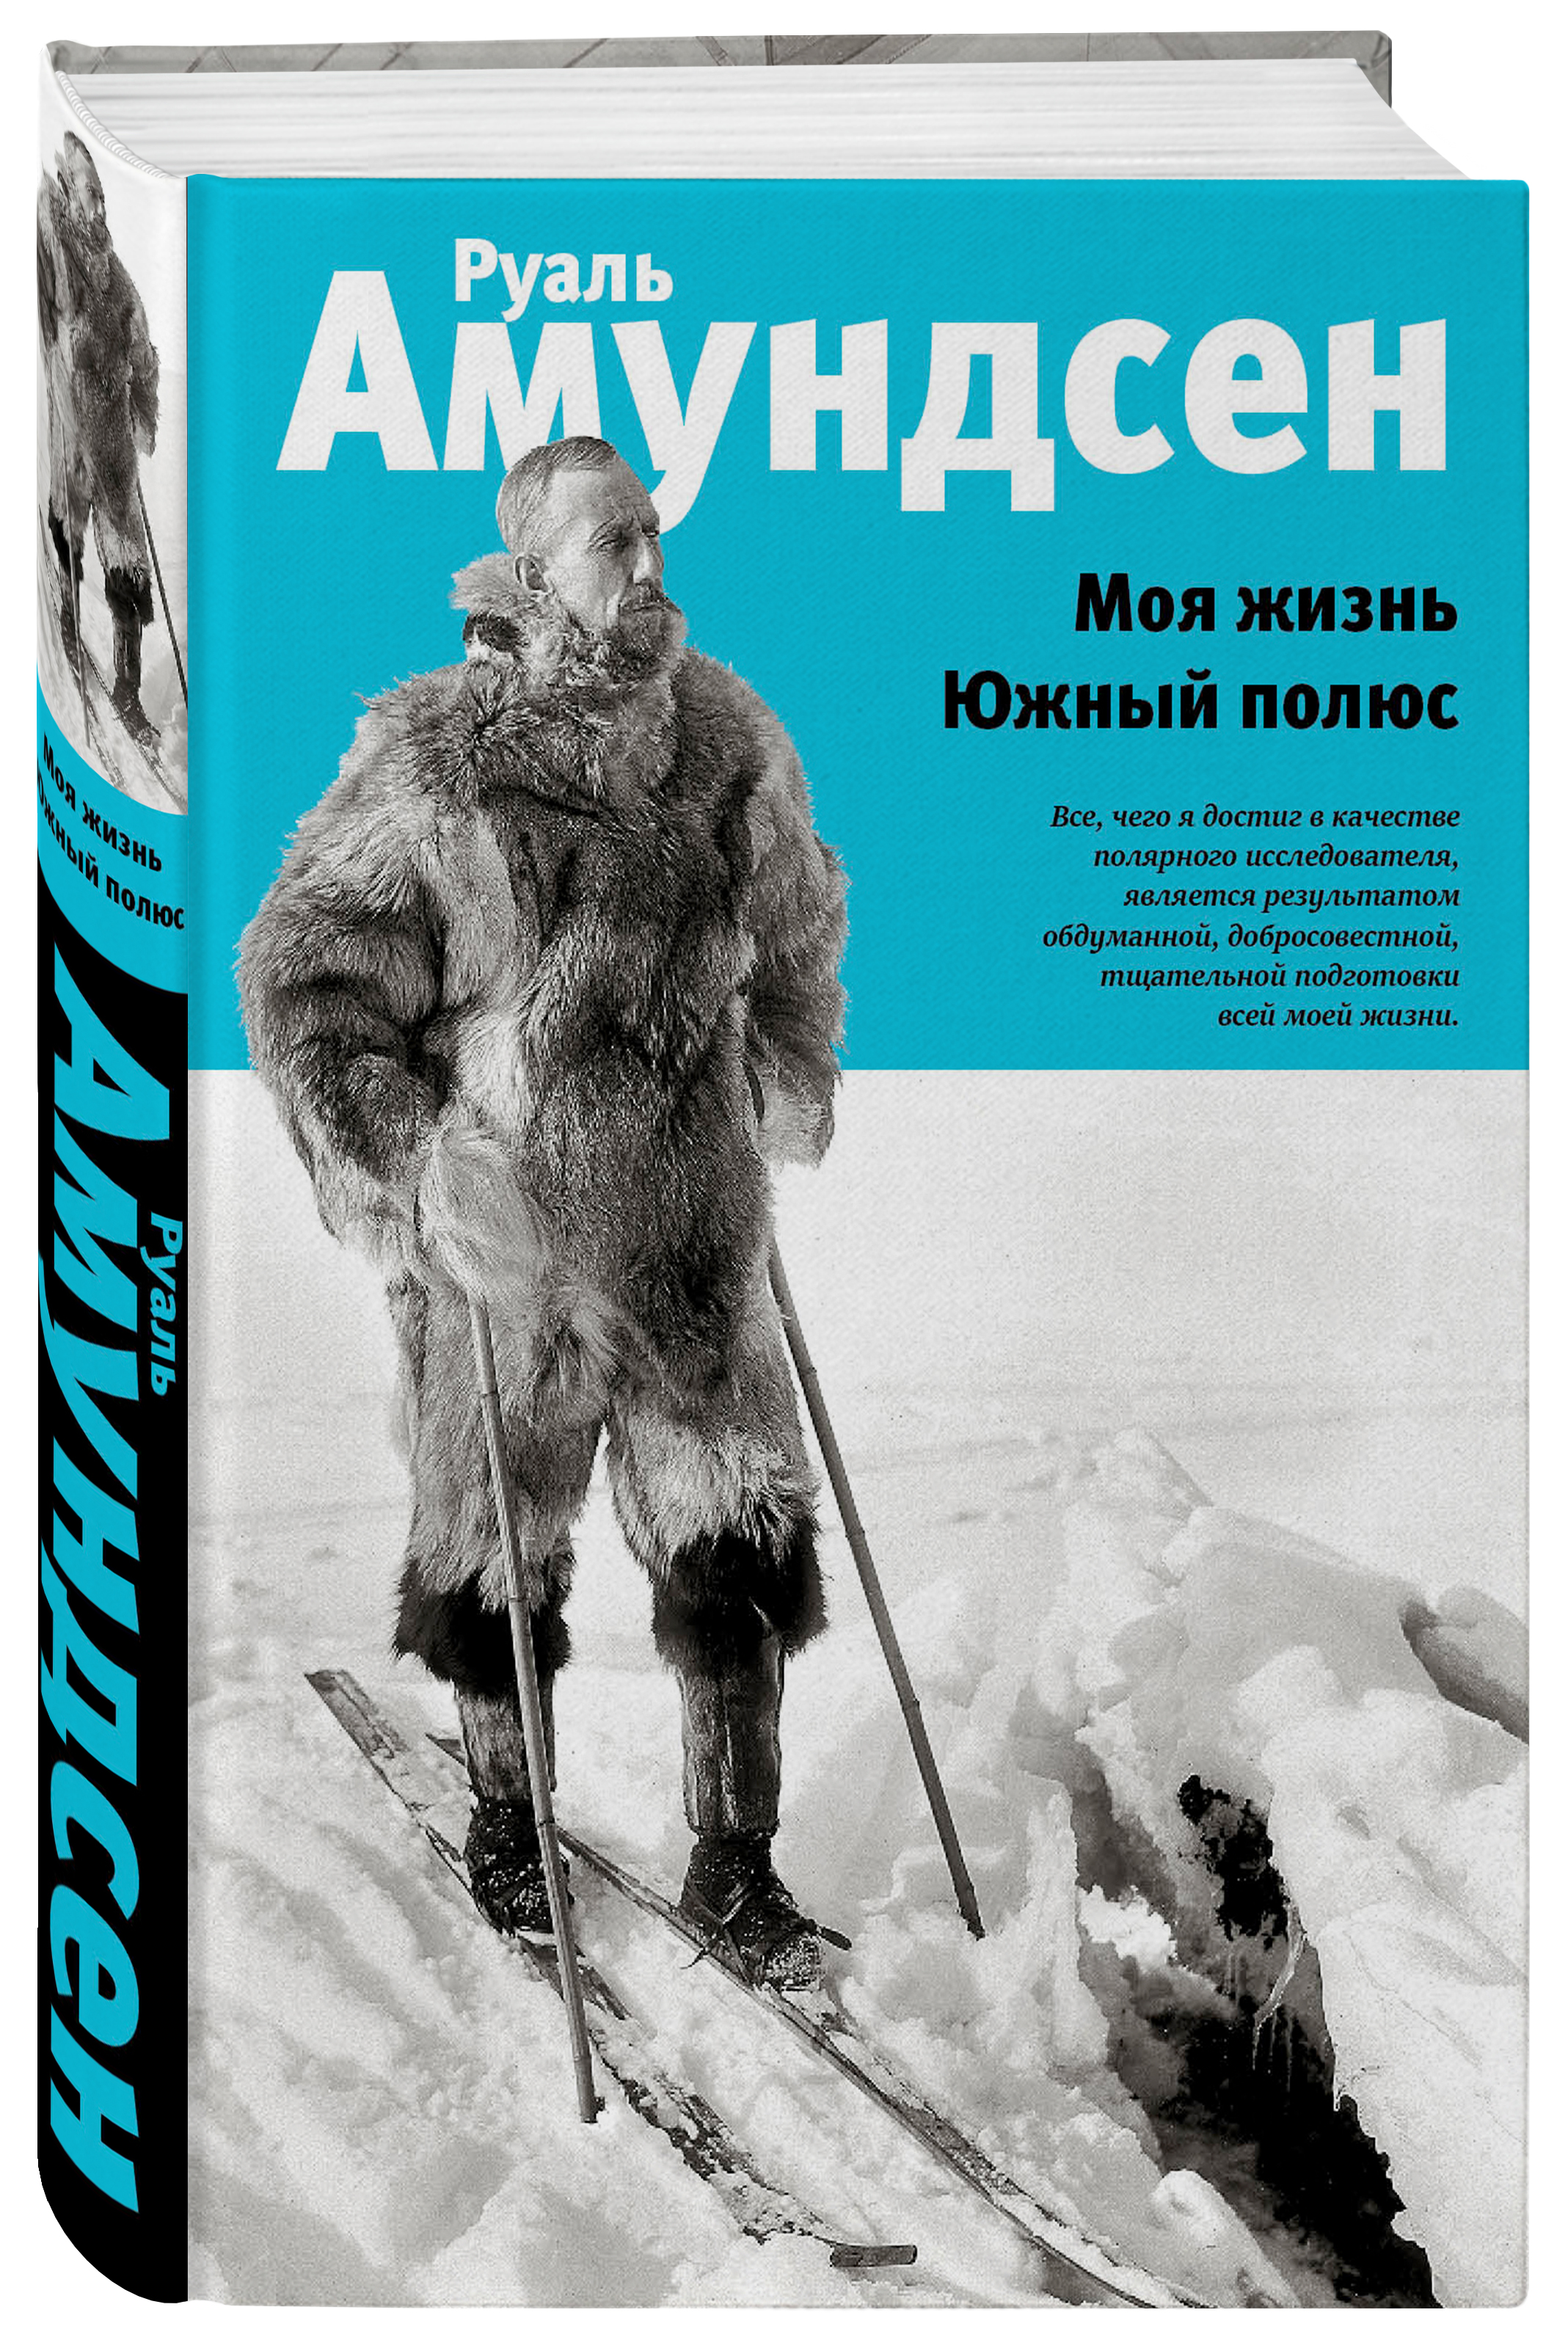 Руаль Амундсен Моя жизнь. Южный полюс bn44 00428b pd55b2 bhs good working tested